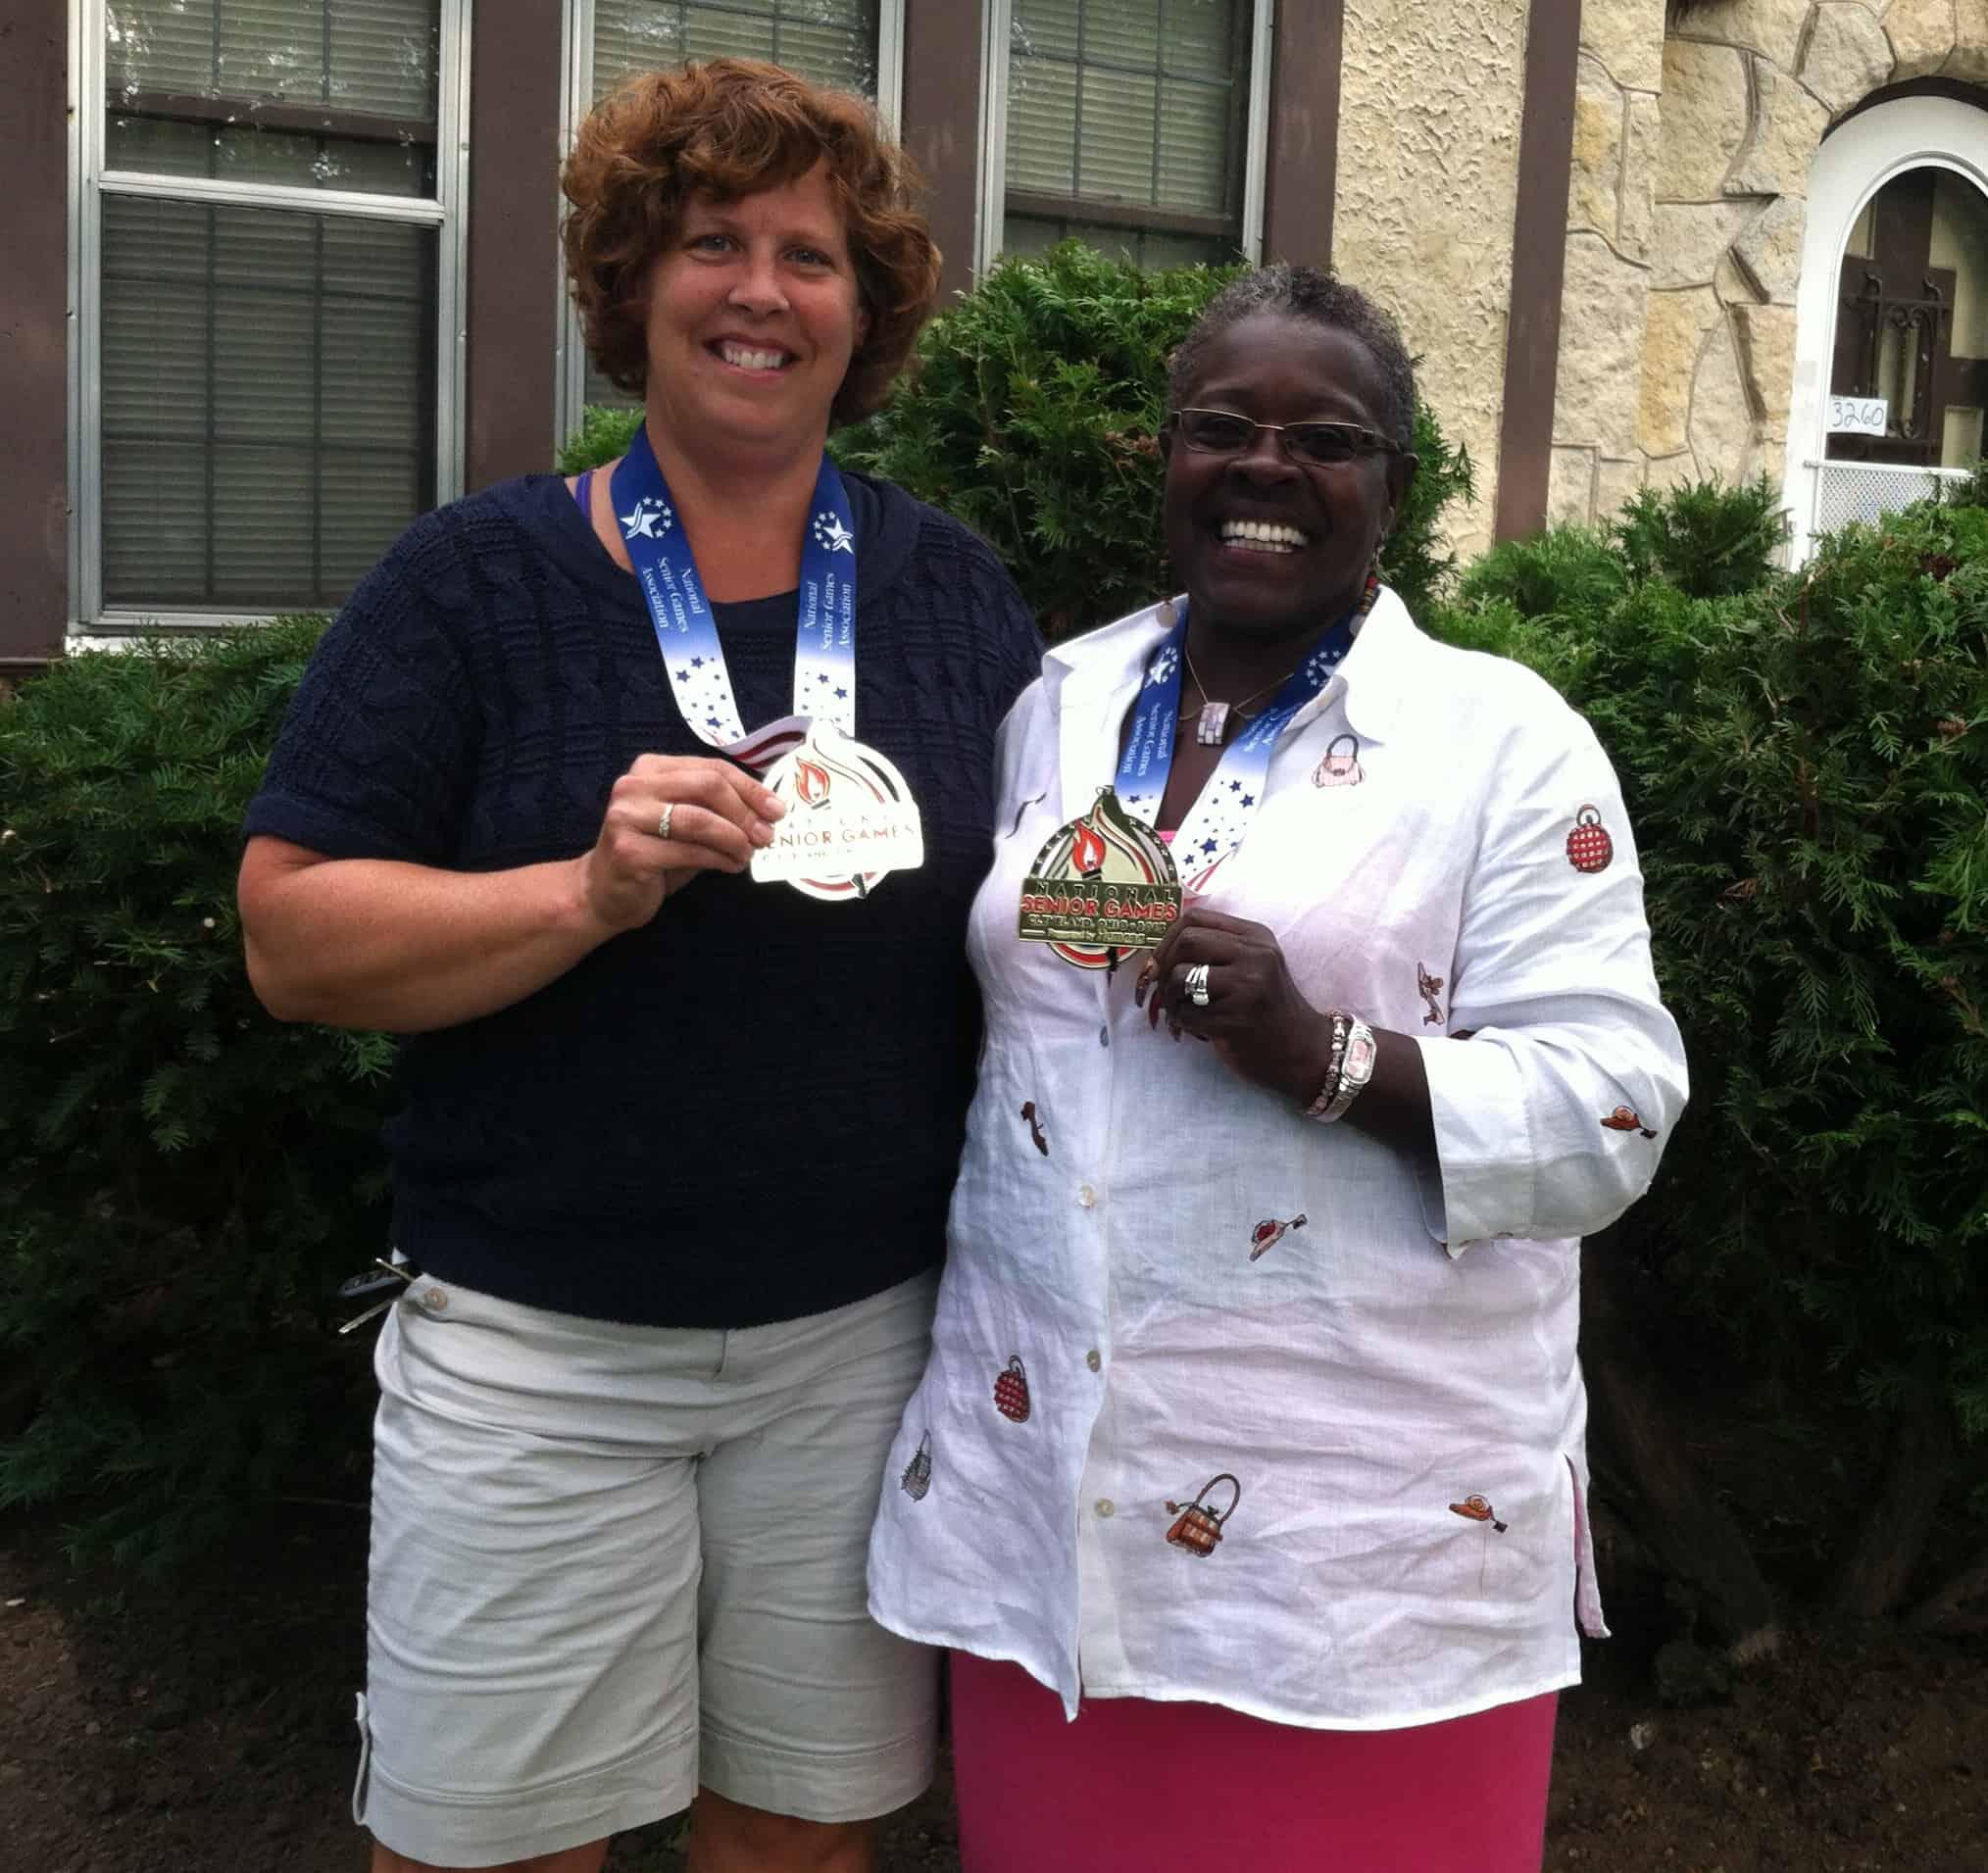 Pam Tullberg and Brenda Cullin